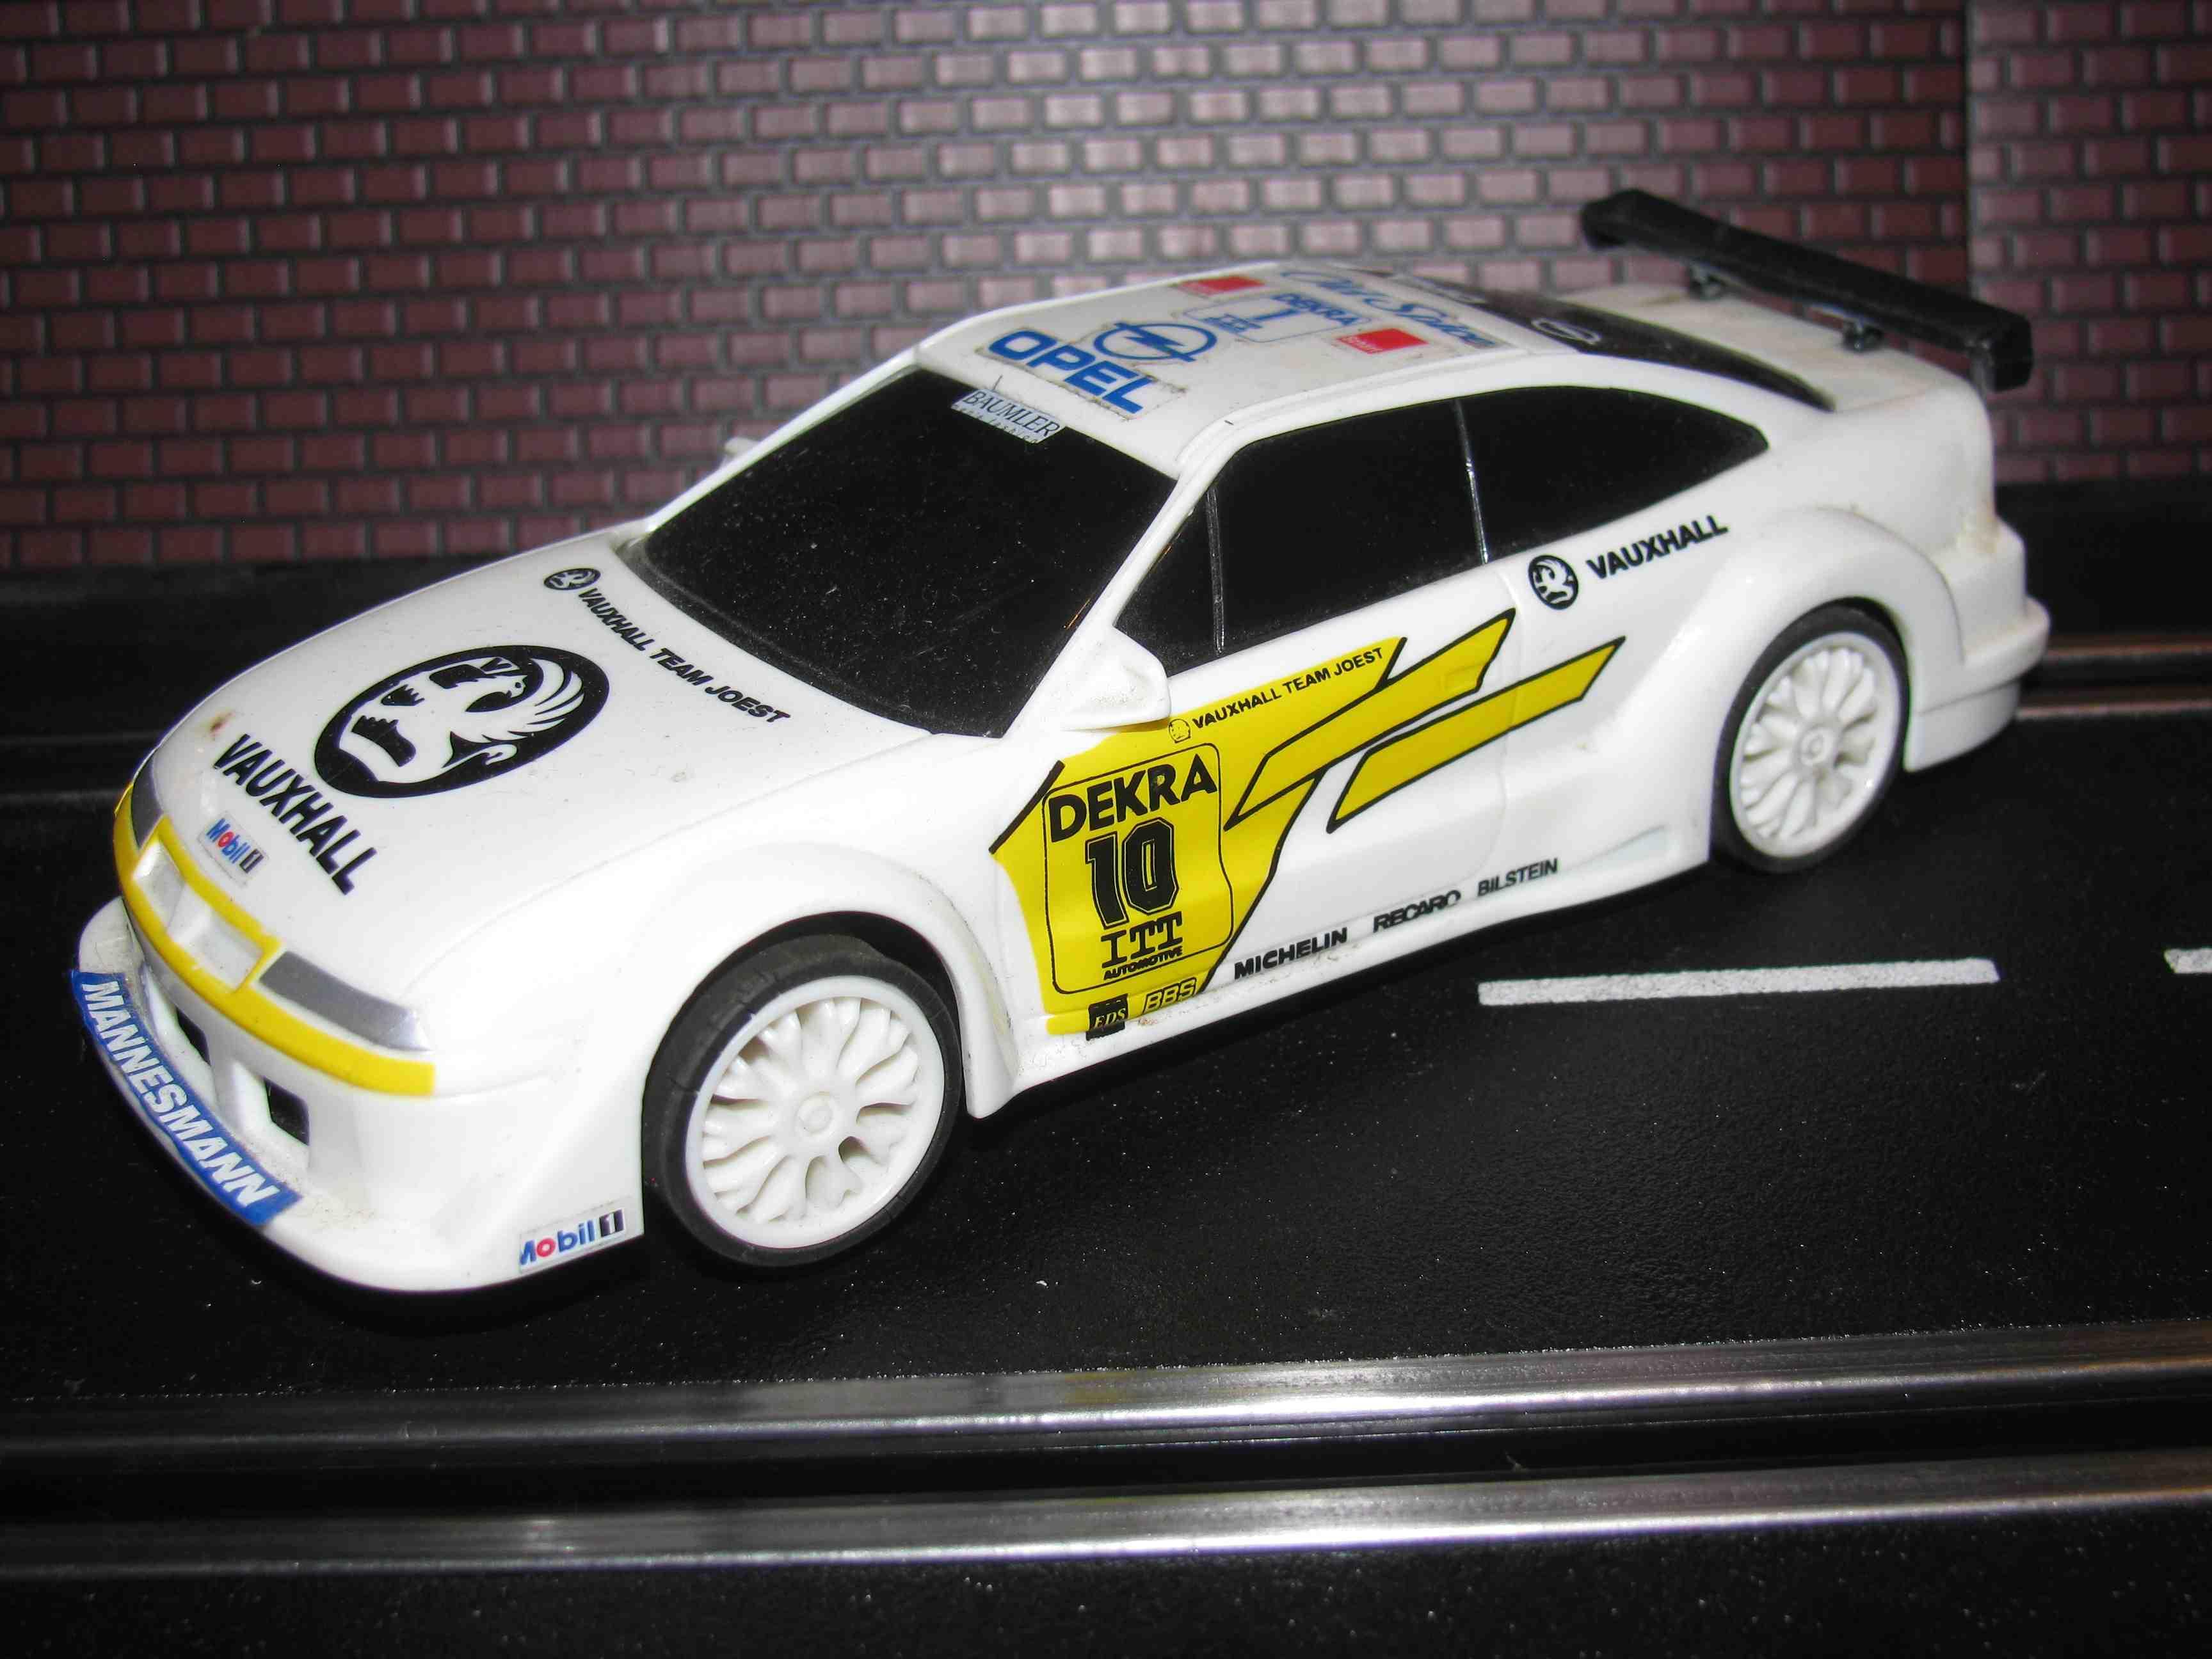 Hornby/SCX D2 OPEL Vauxhall Team Joest DEKRA Racer Slot Car 1/32 Scale, White, Car 10